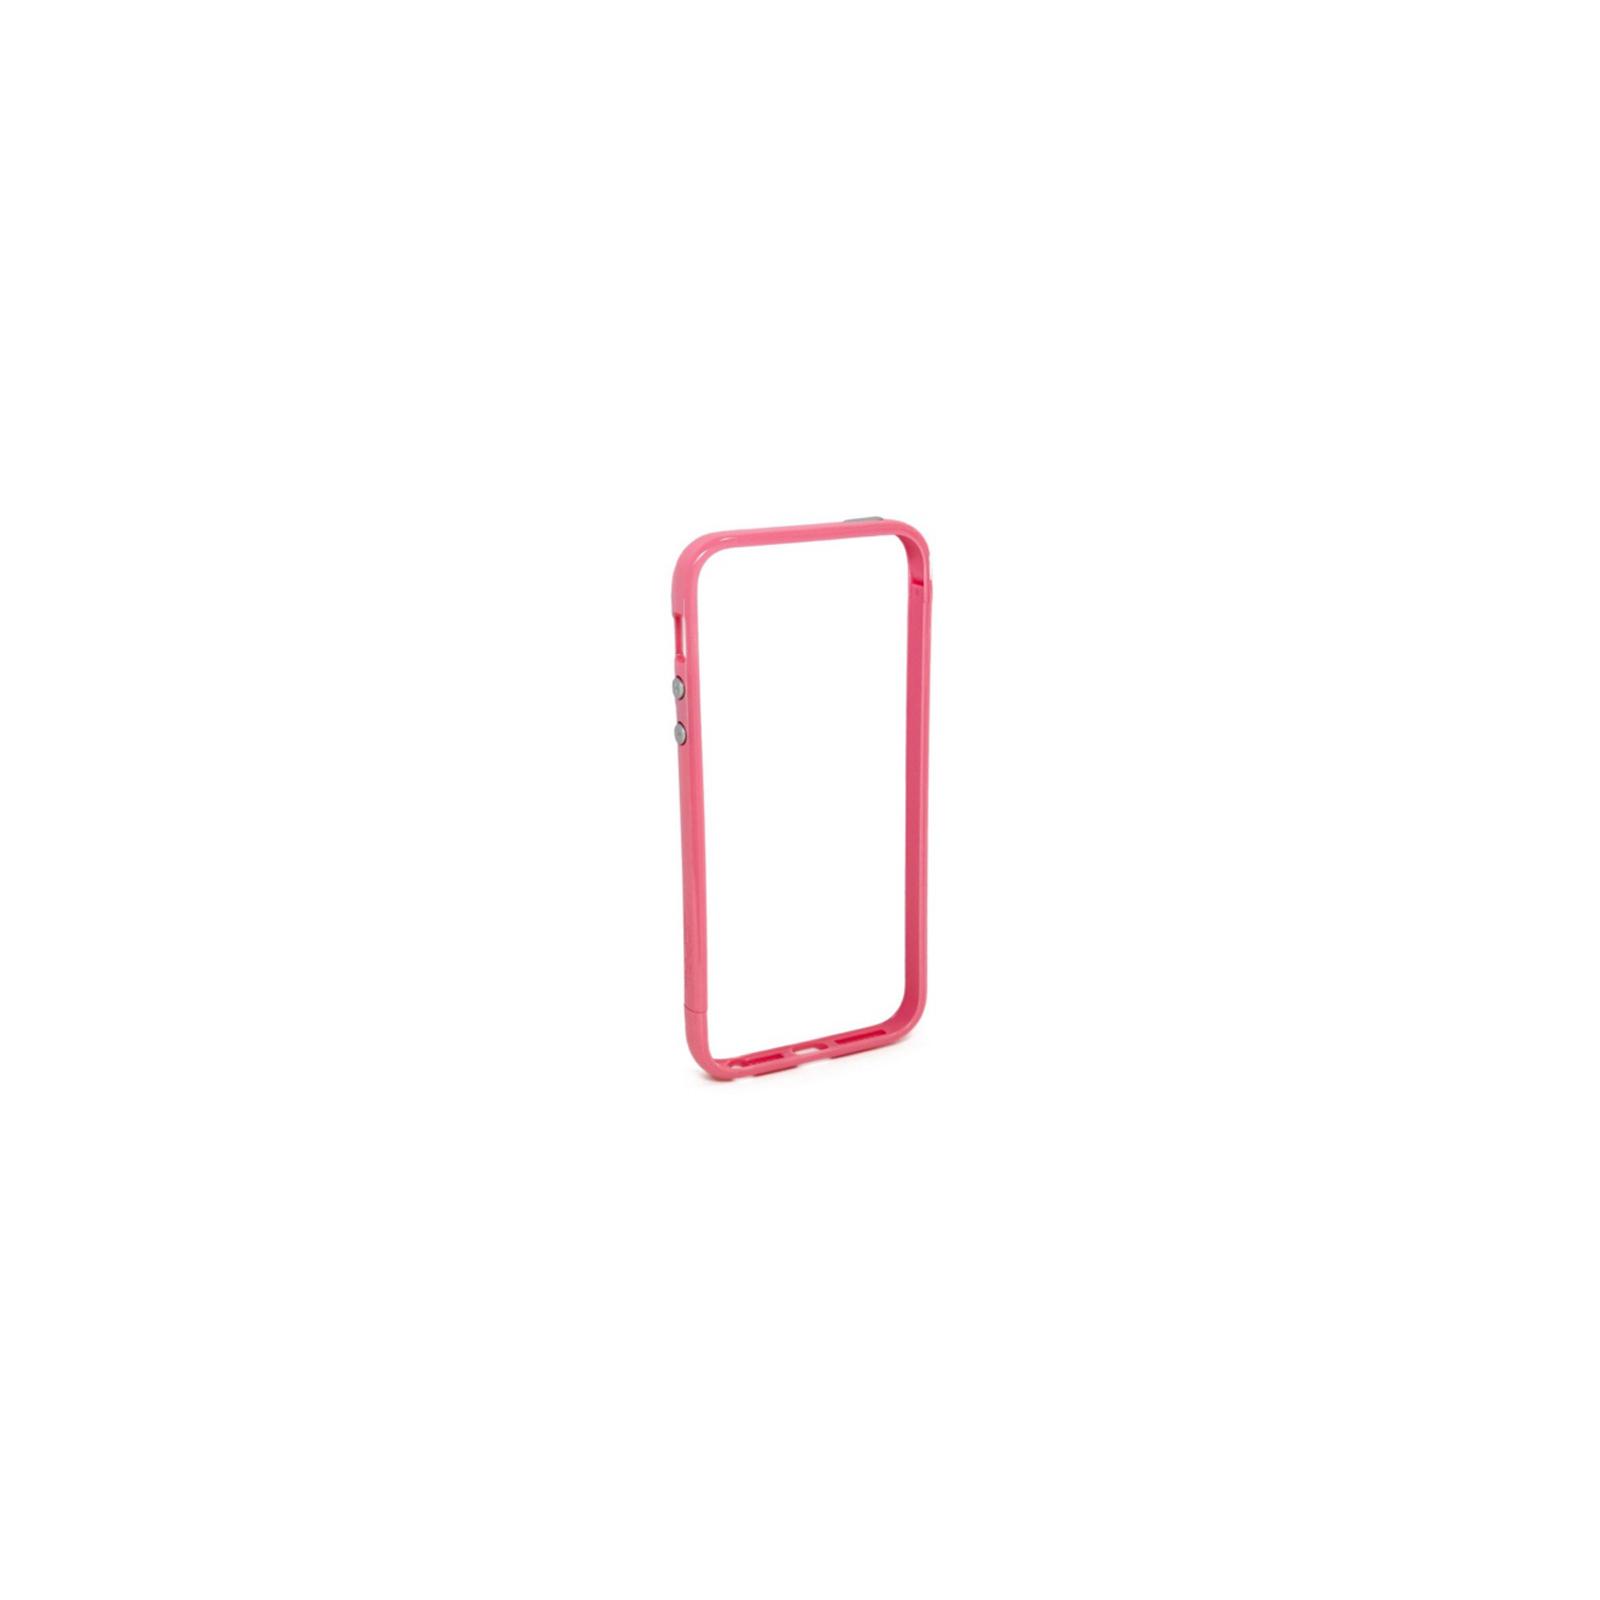 Чехол для моб. телефона JCPAL Colorful 3 in 1 для iPhone 5S/5 Set-Pink (JCP3219)